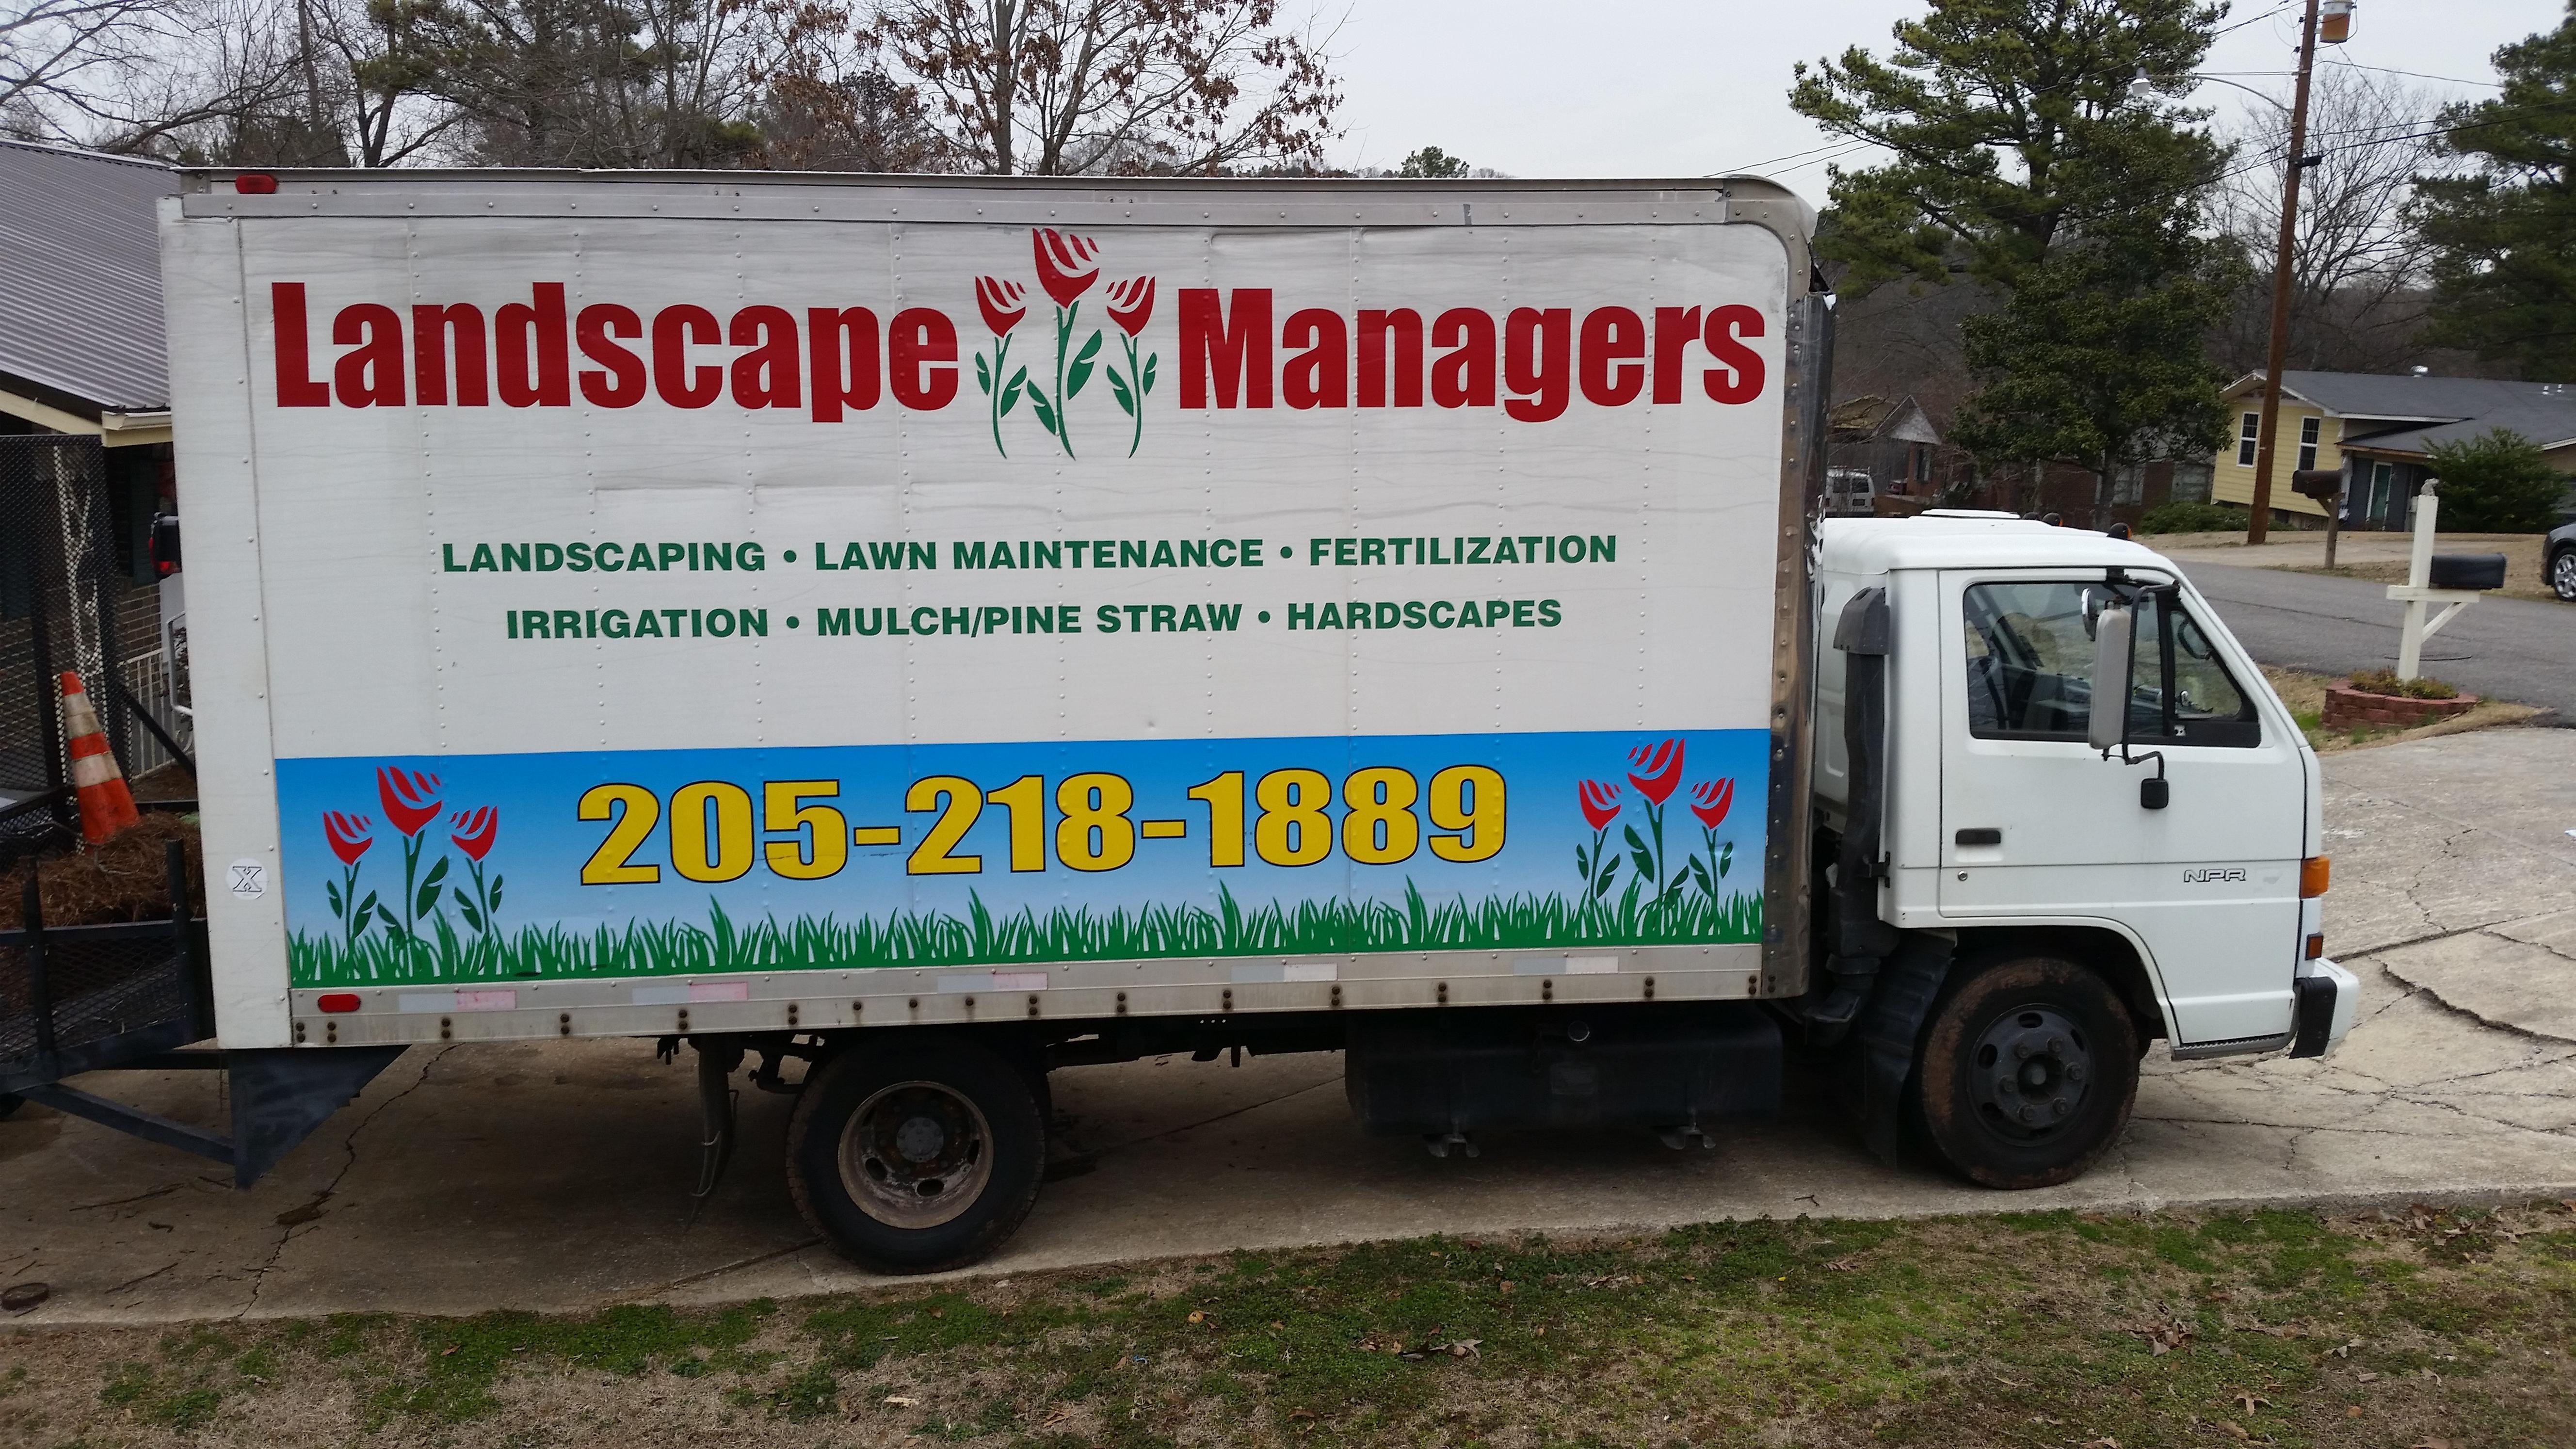 Landscape Managers